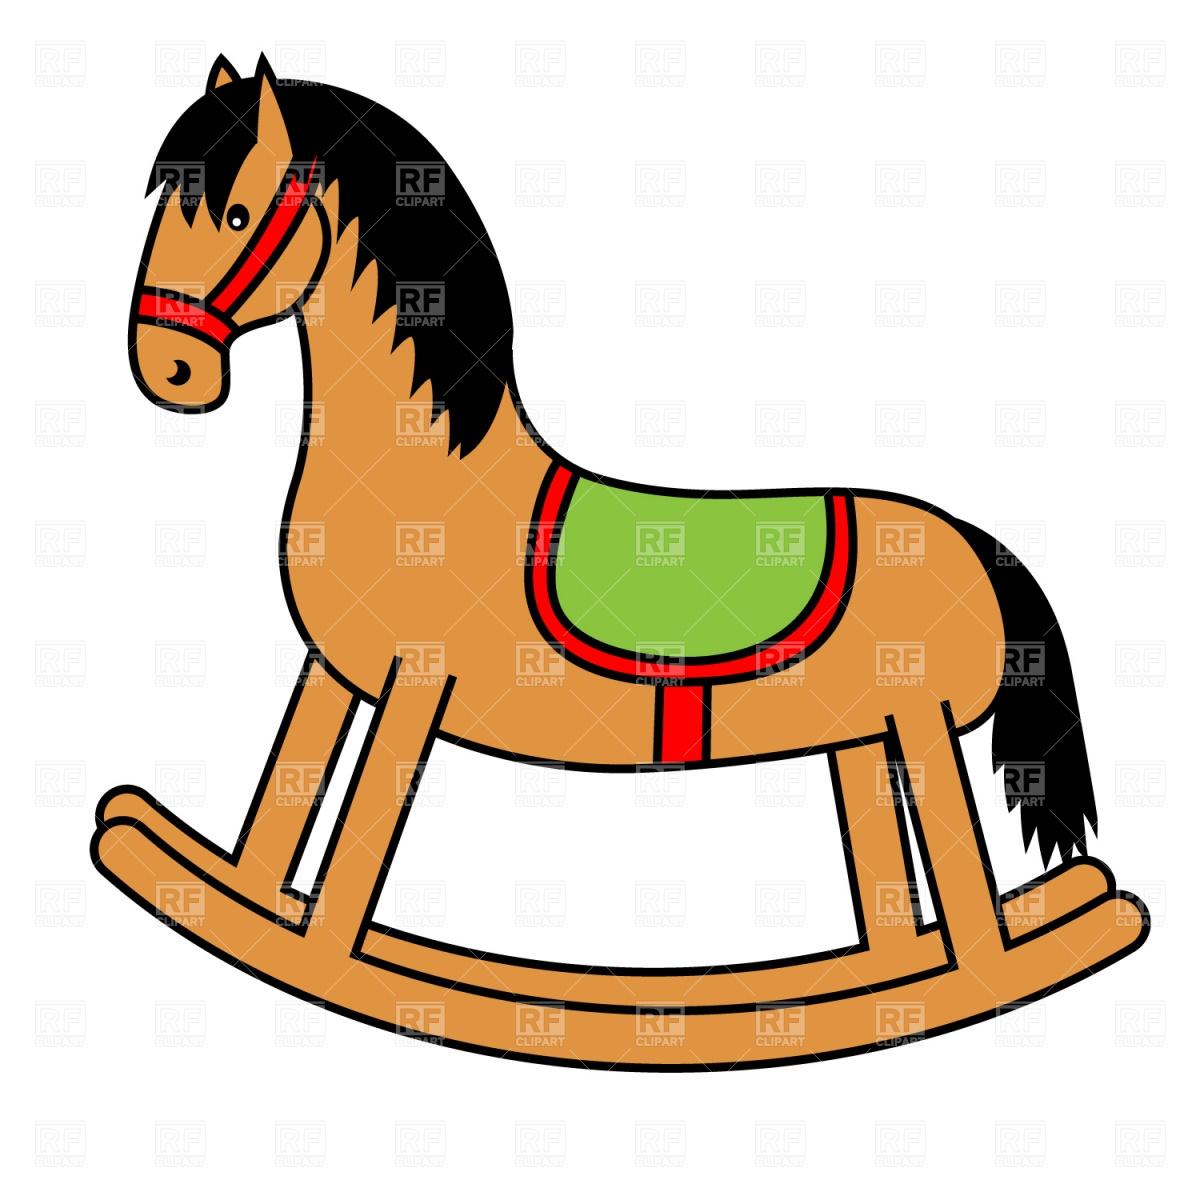 Rocking Horse 1328 Plants And Animals Do-Rocking Horse 1328 Plants And Animals Download Royalty Free Vector-7